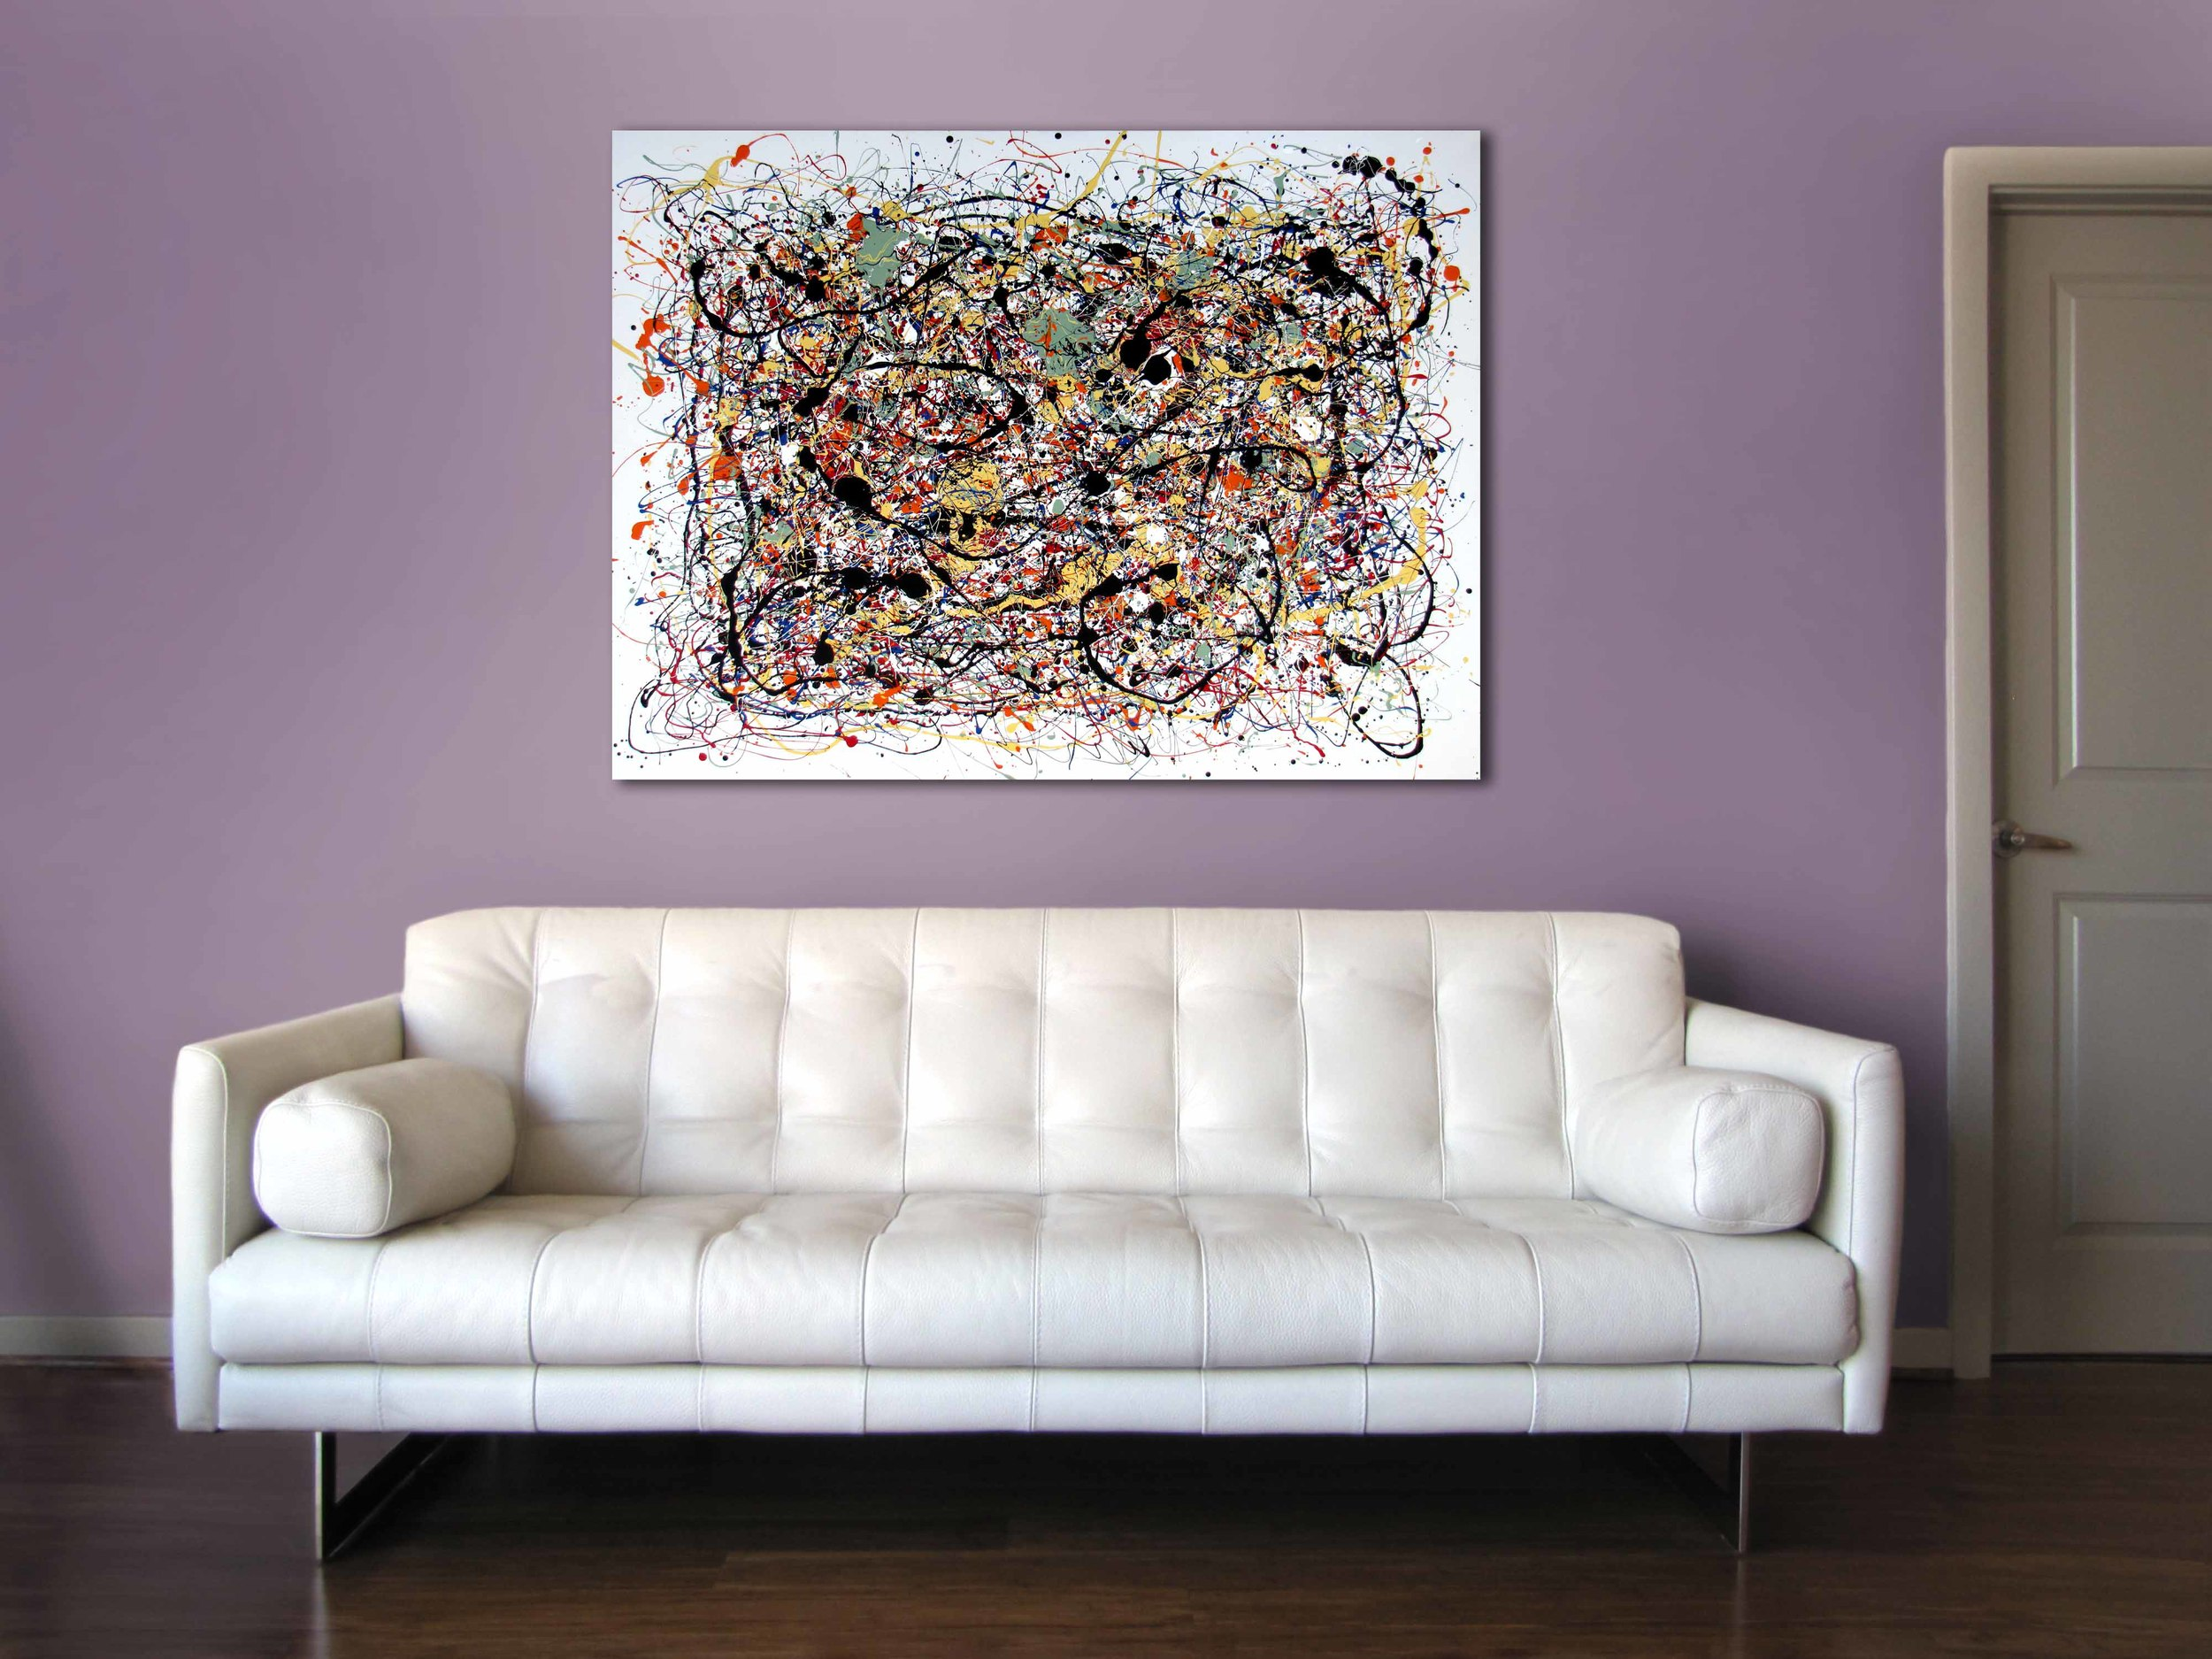 Sofa Wall I am neutral red lavender.jpg